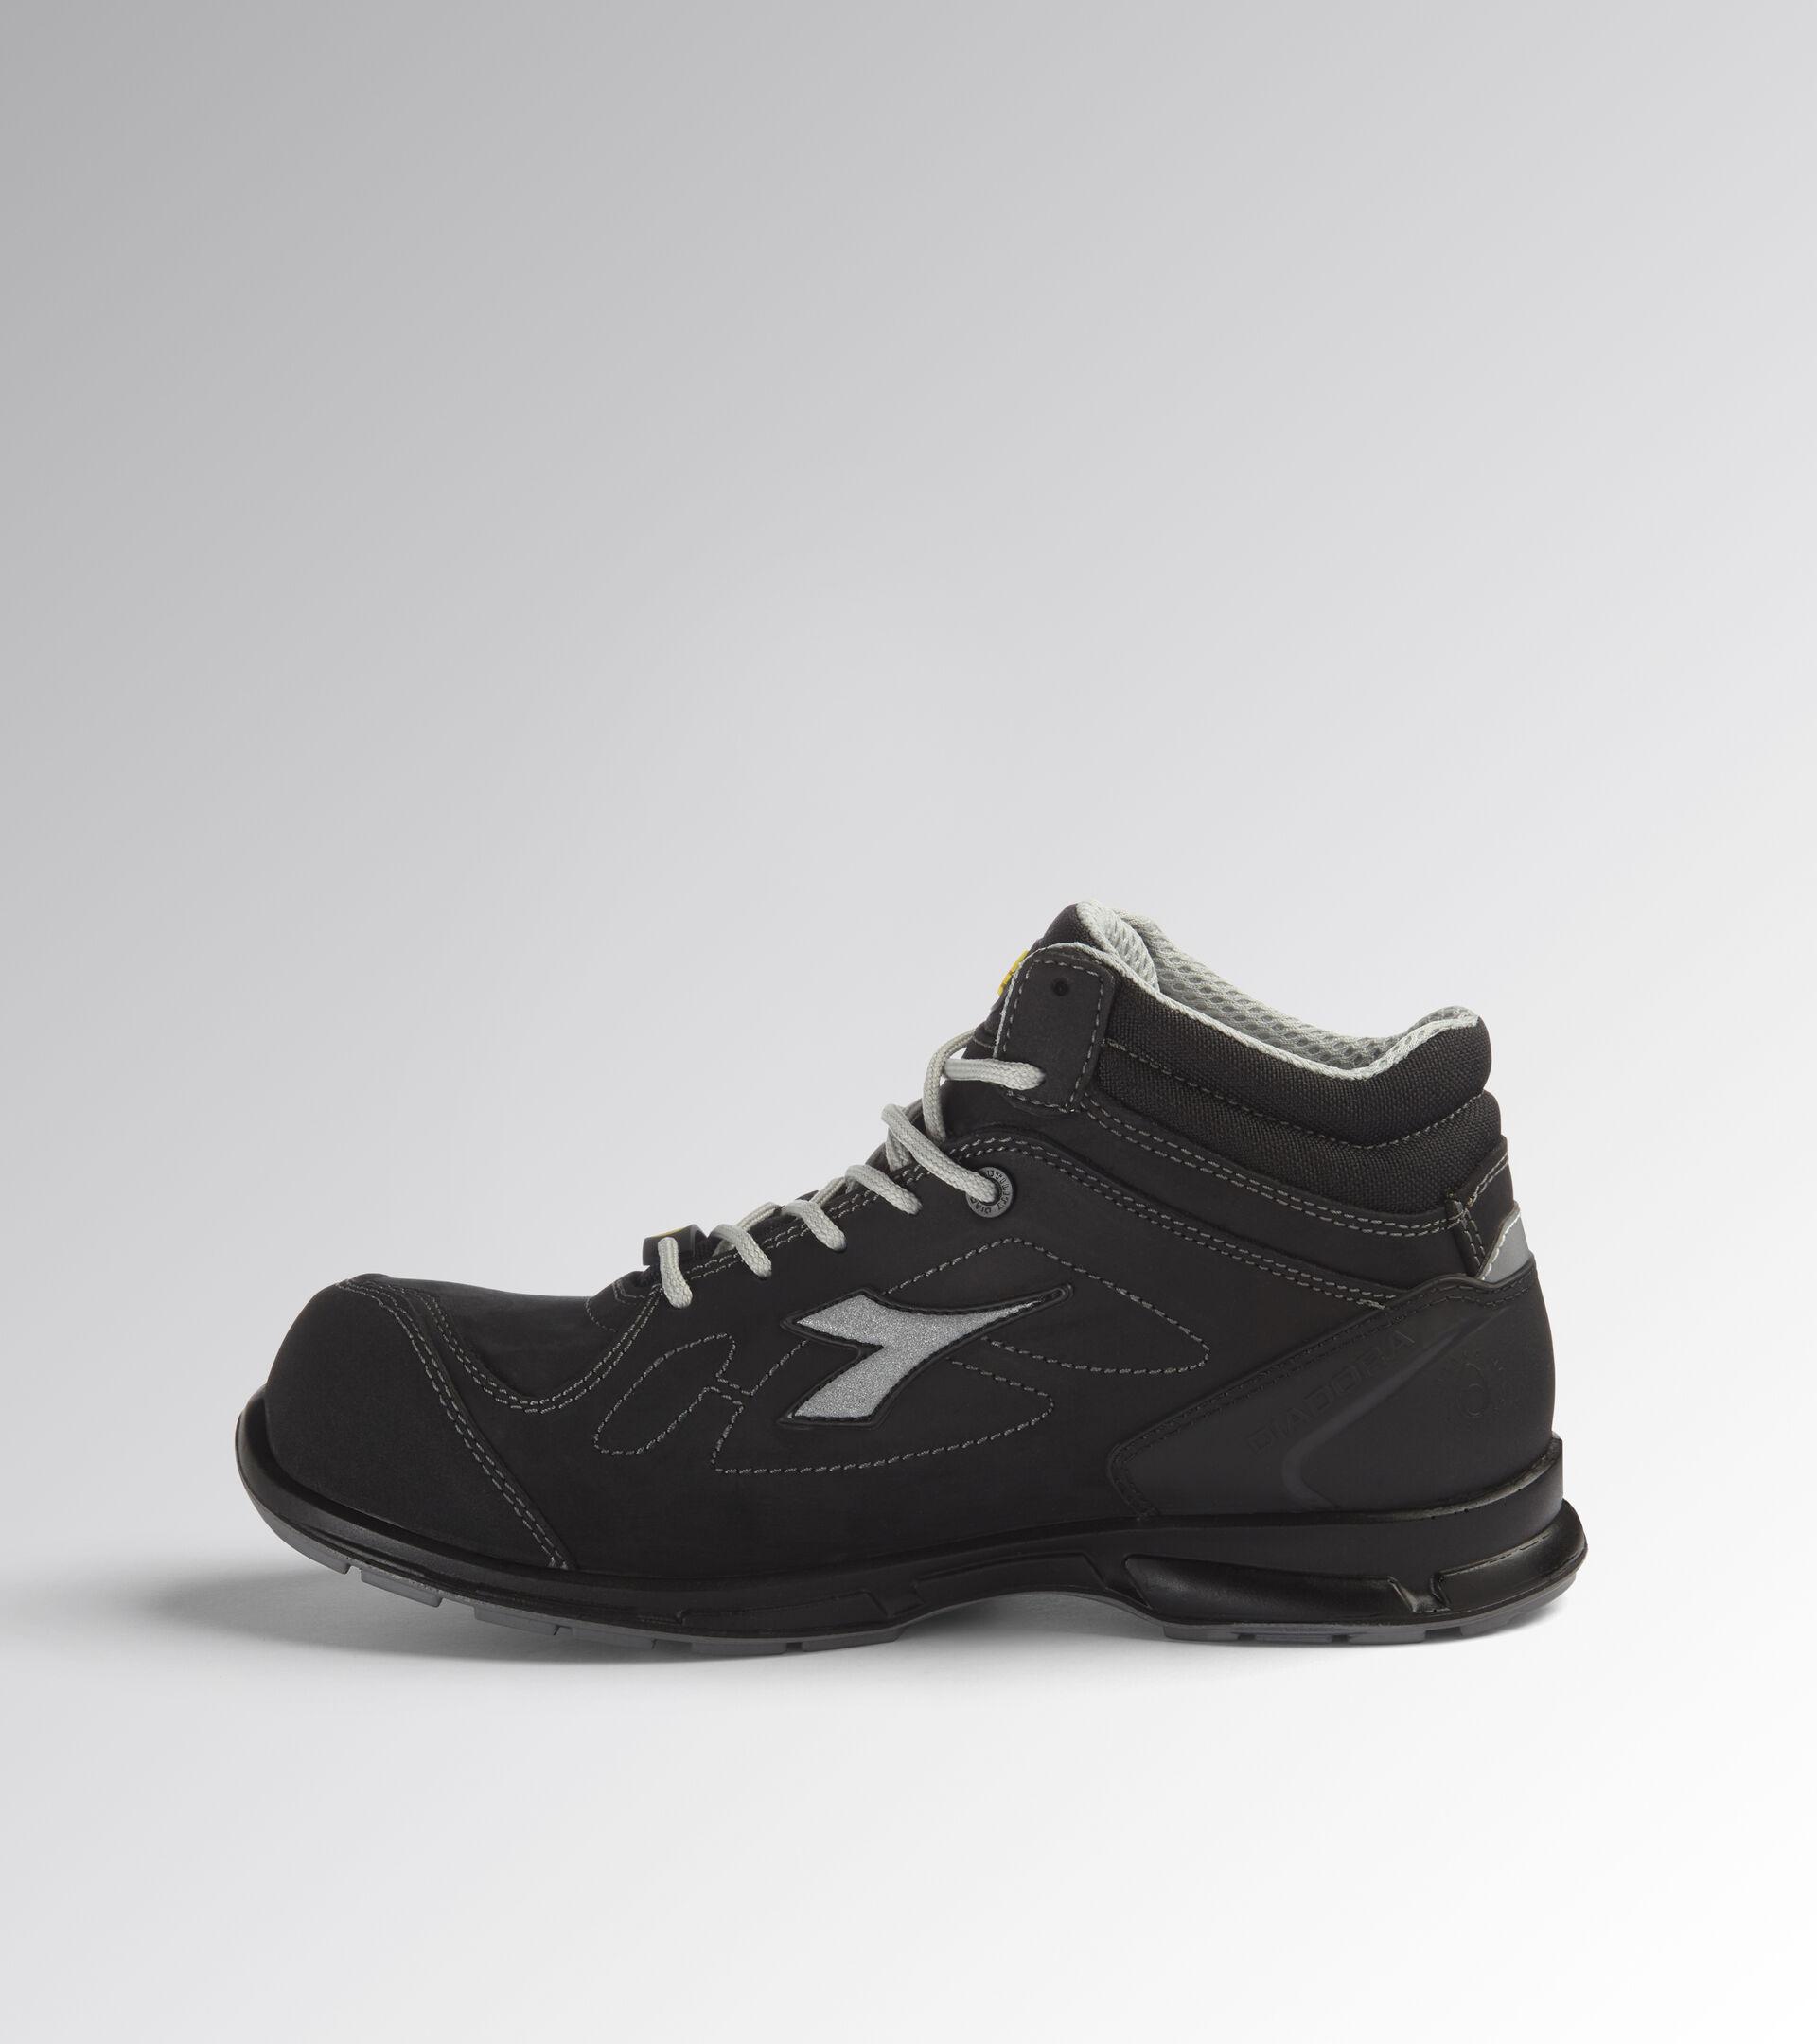 Footwear Utility UOMO FLEX MID S3 SRC ESD SCHWARZ Utility